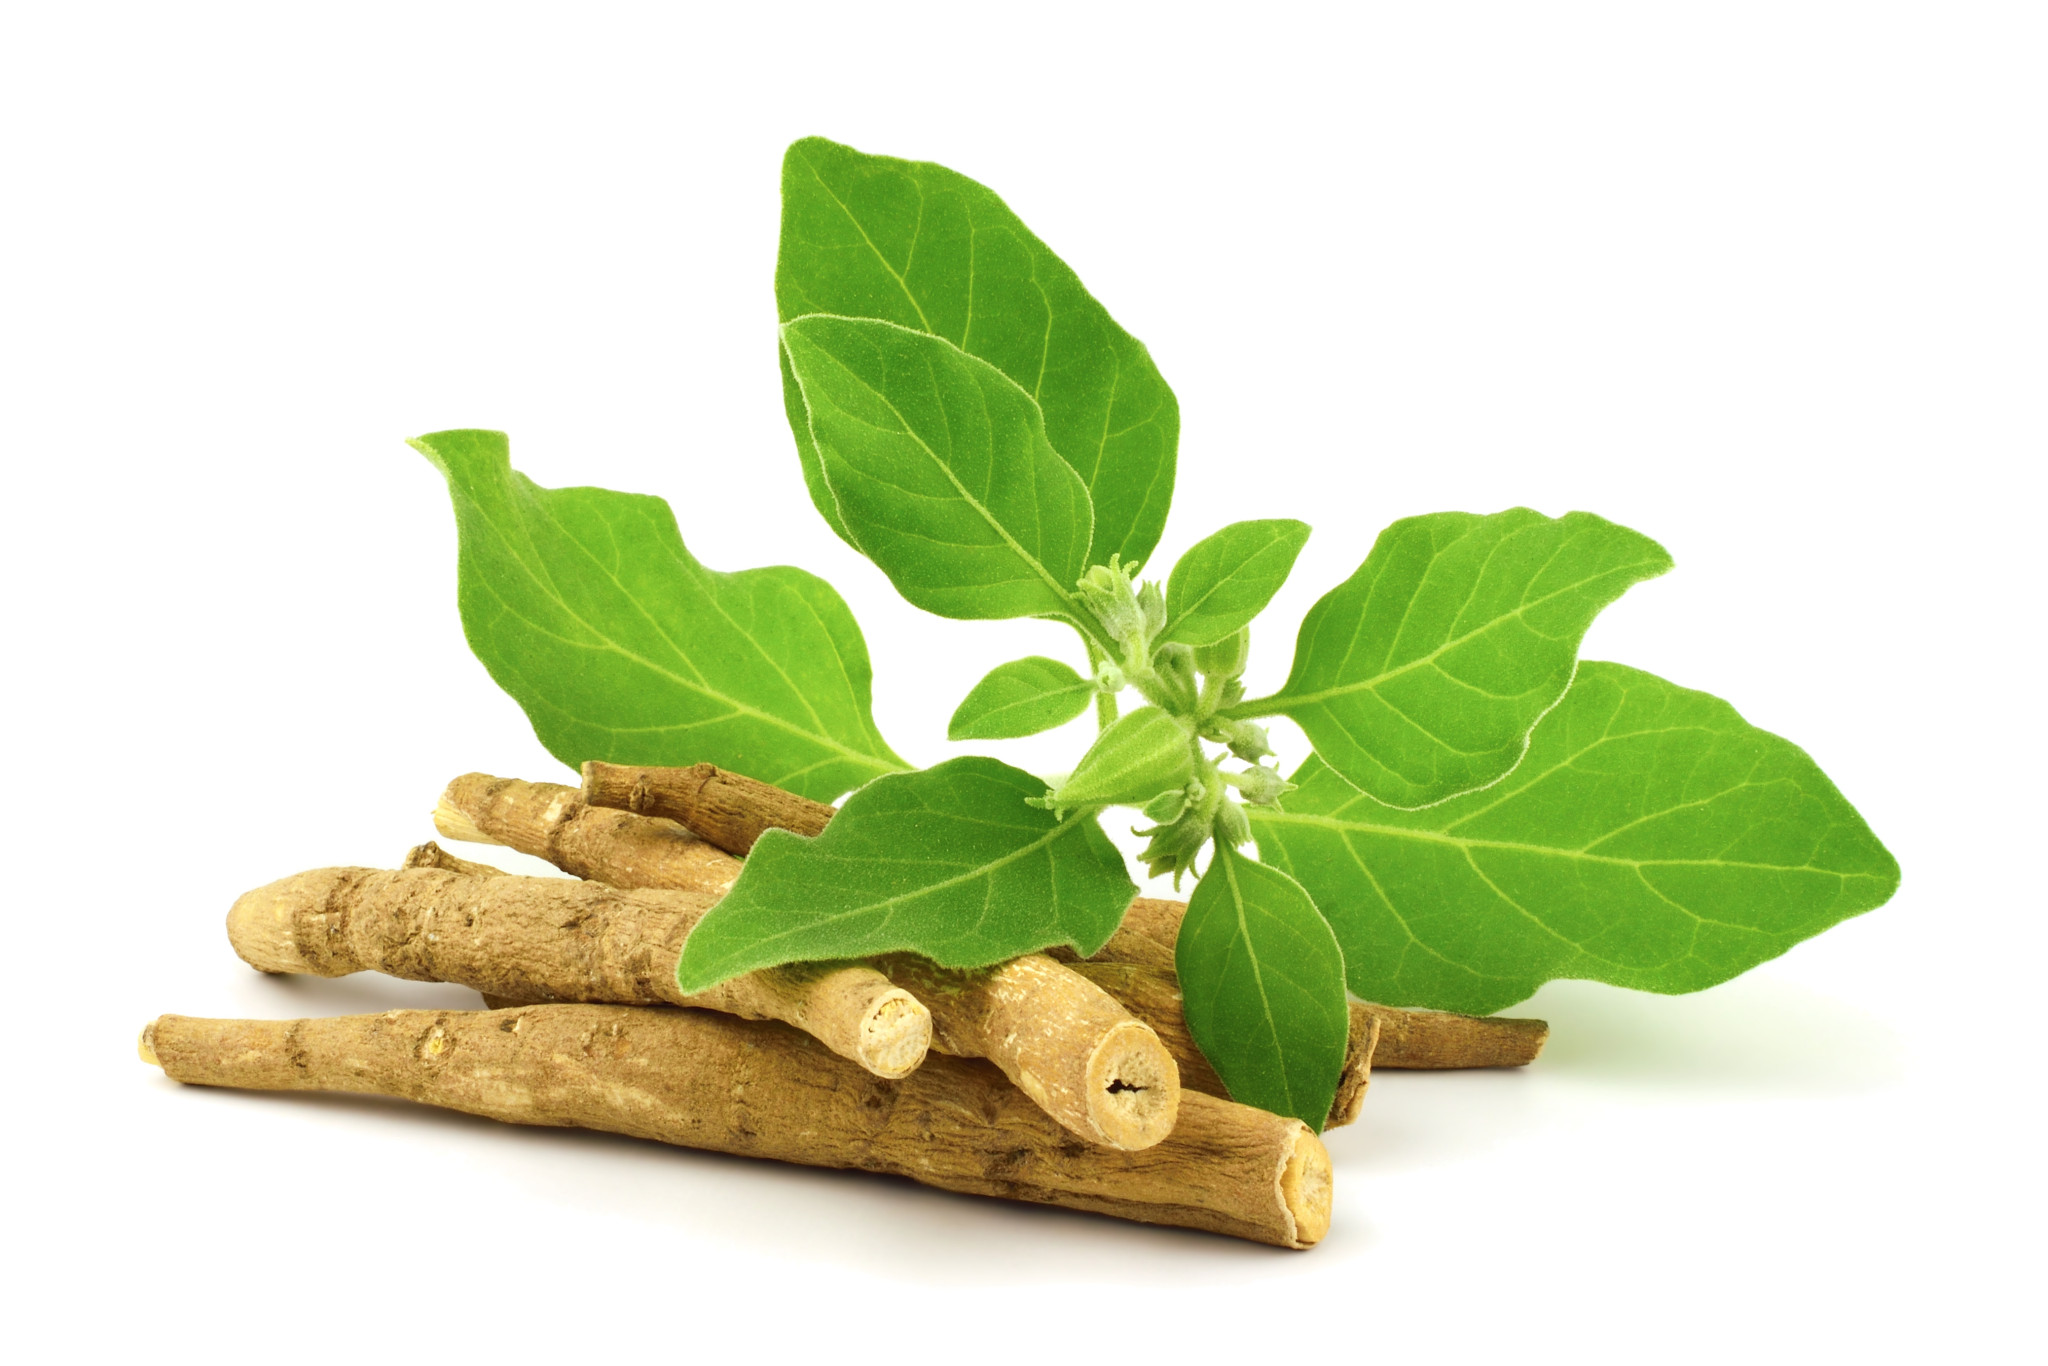 Food News - Arjuna Natural focuses on immuno-modulatory effects of ashwagandha